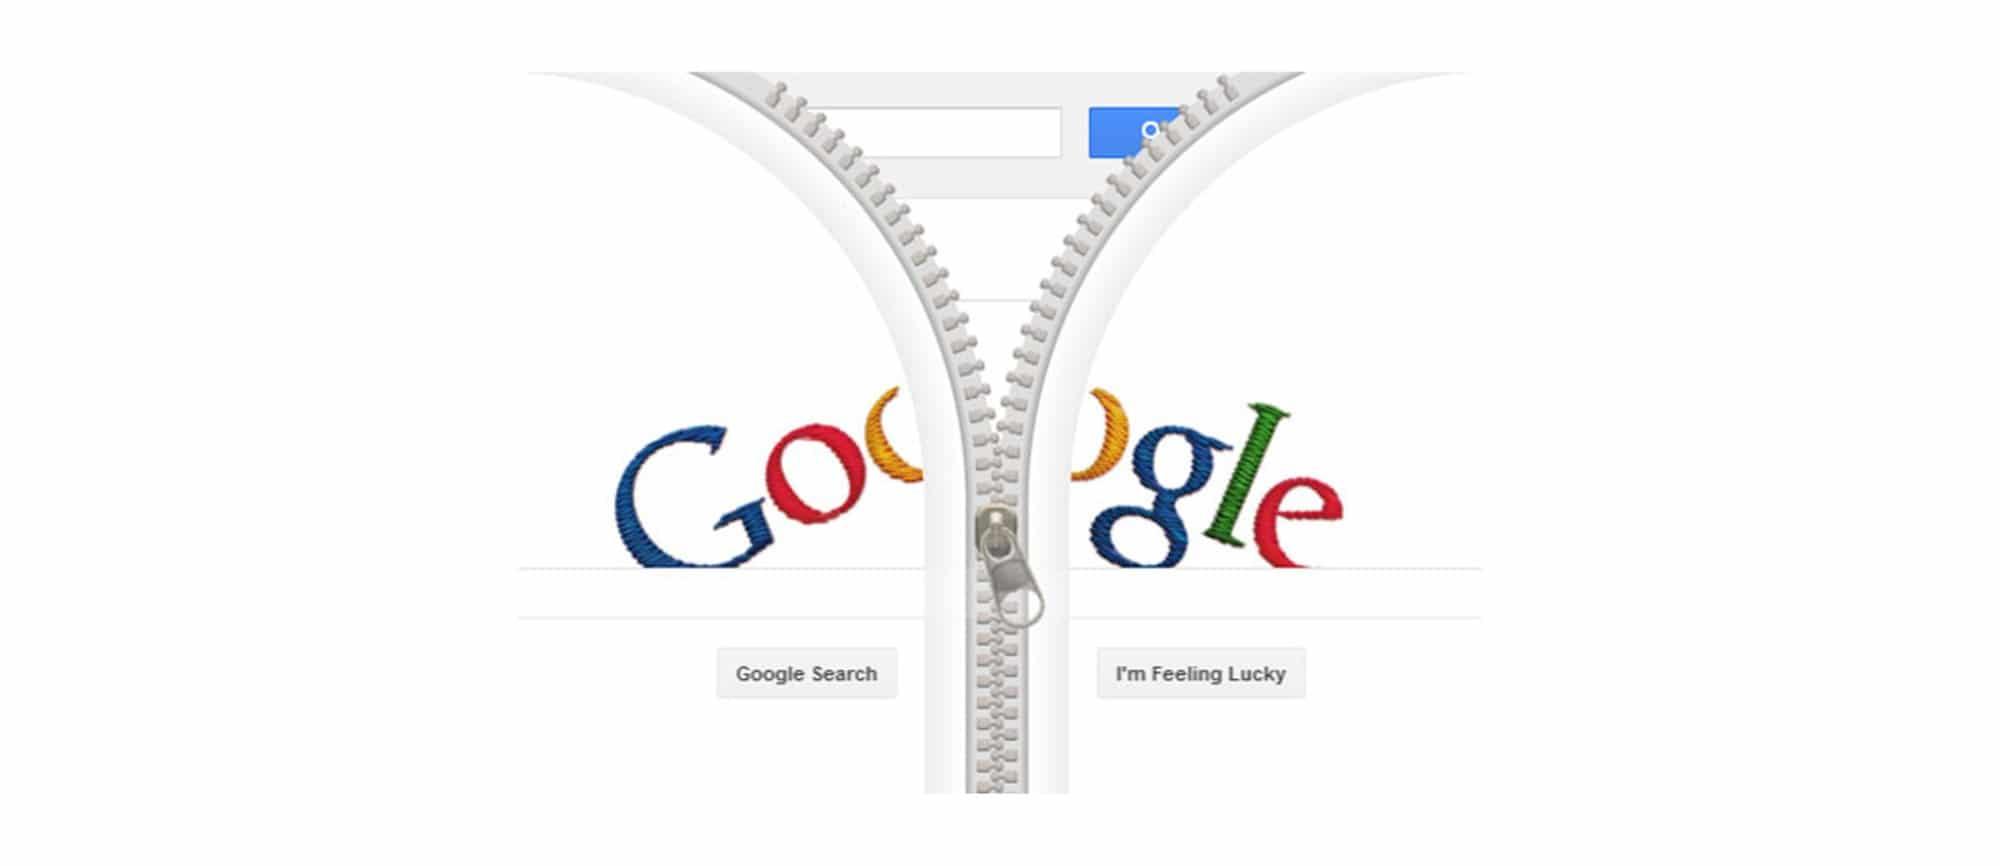 Google en ligne datant Guy en ligne rencontre profil